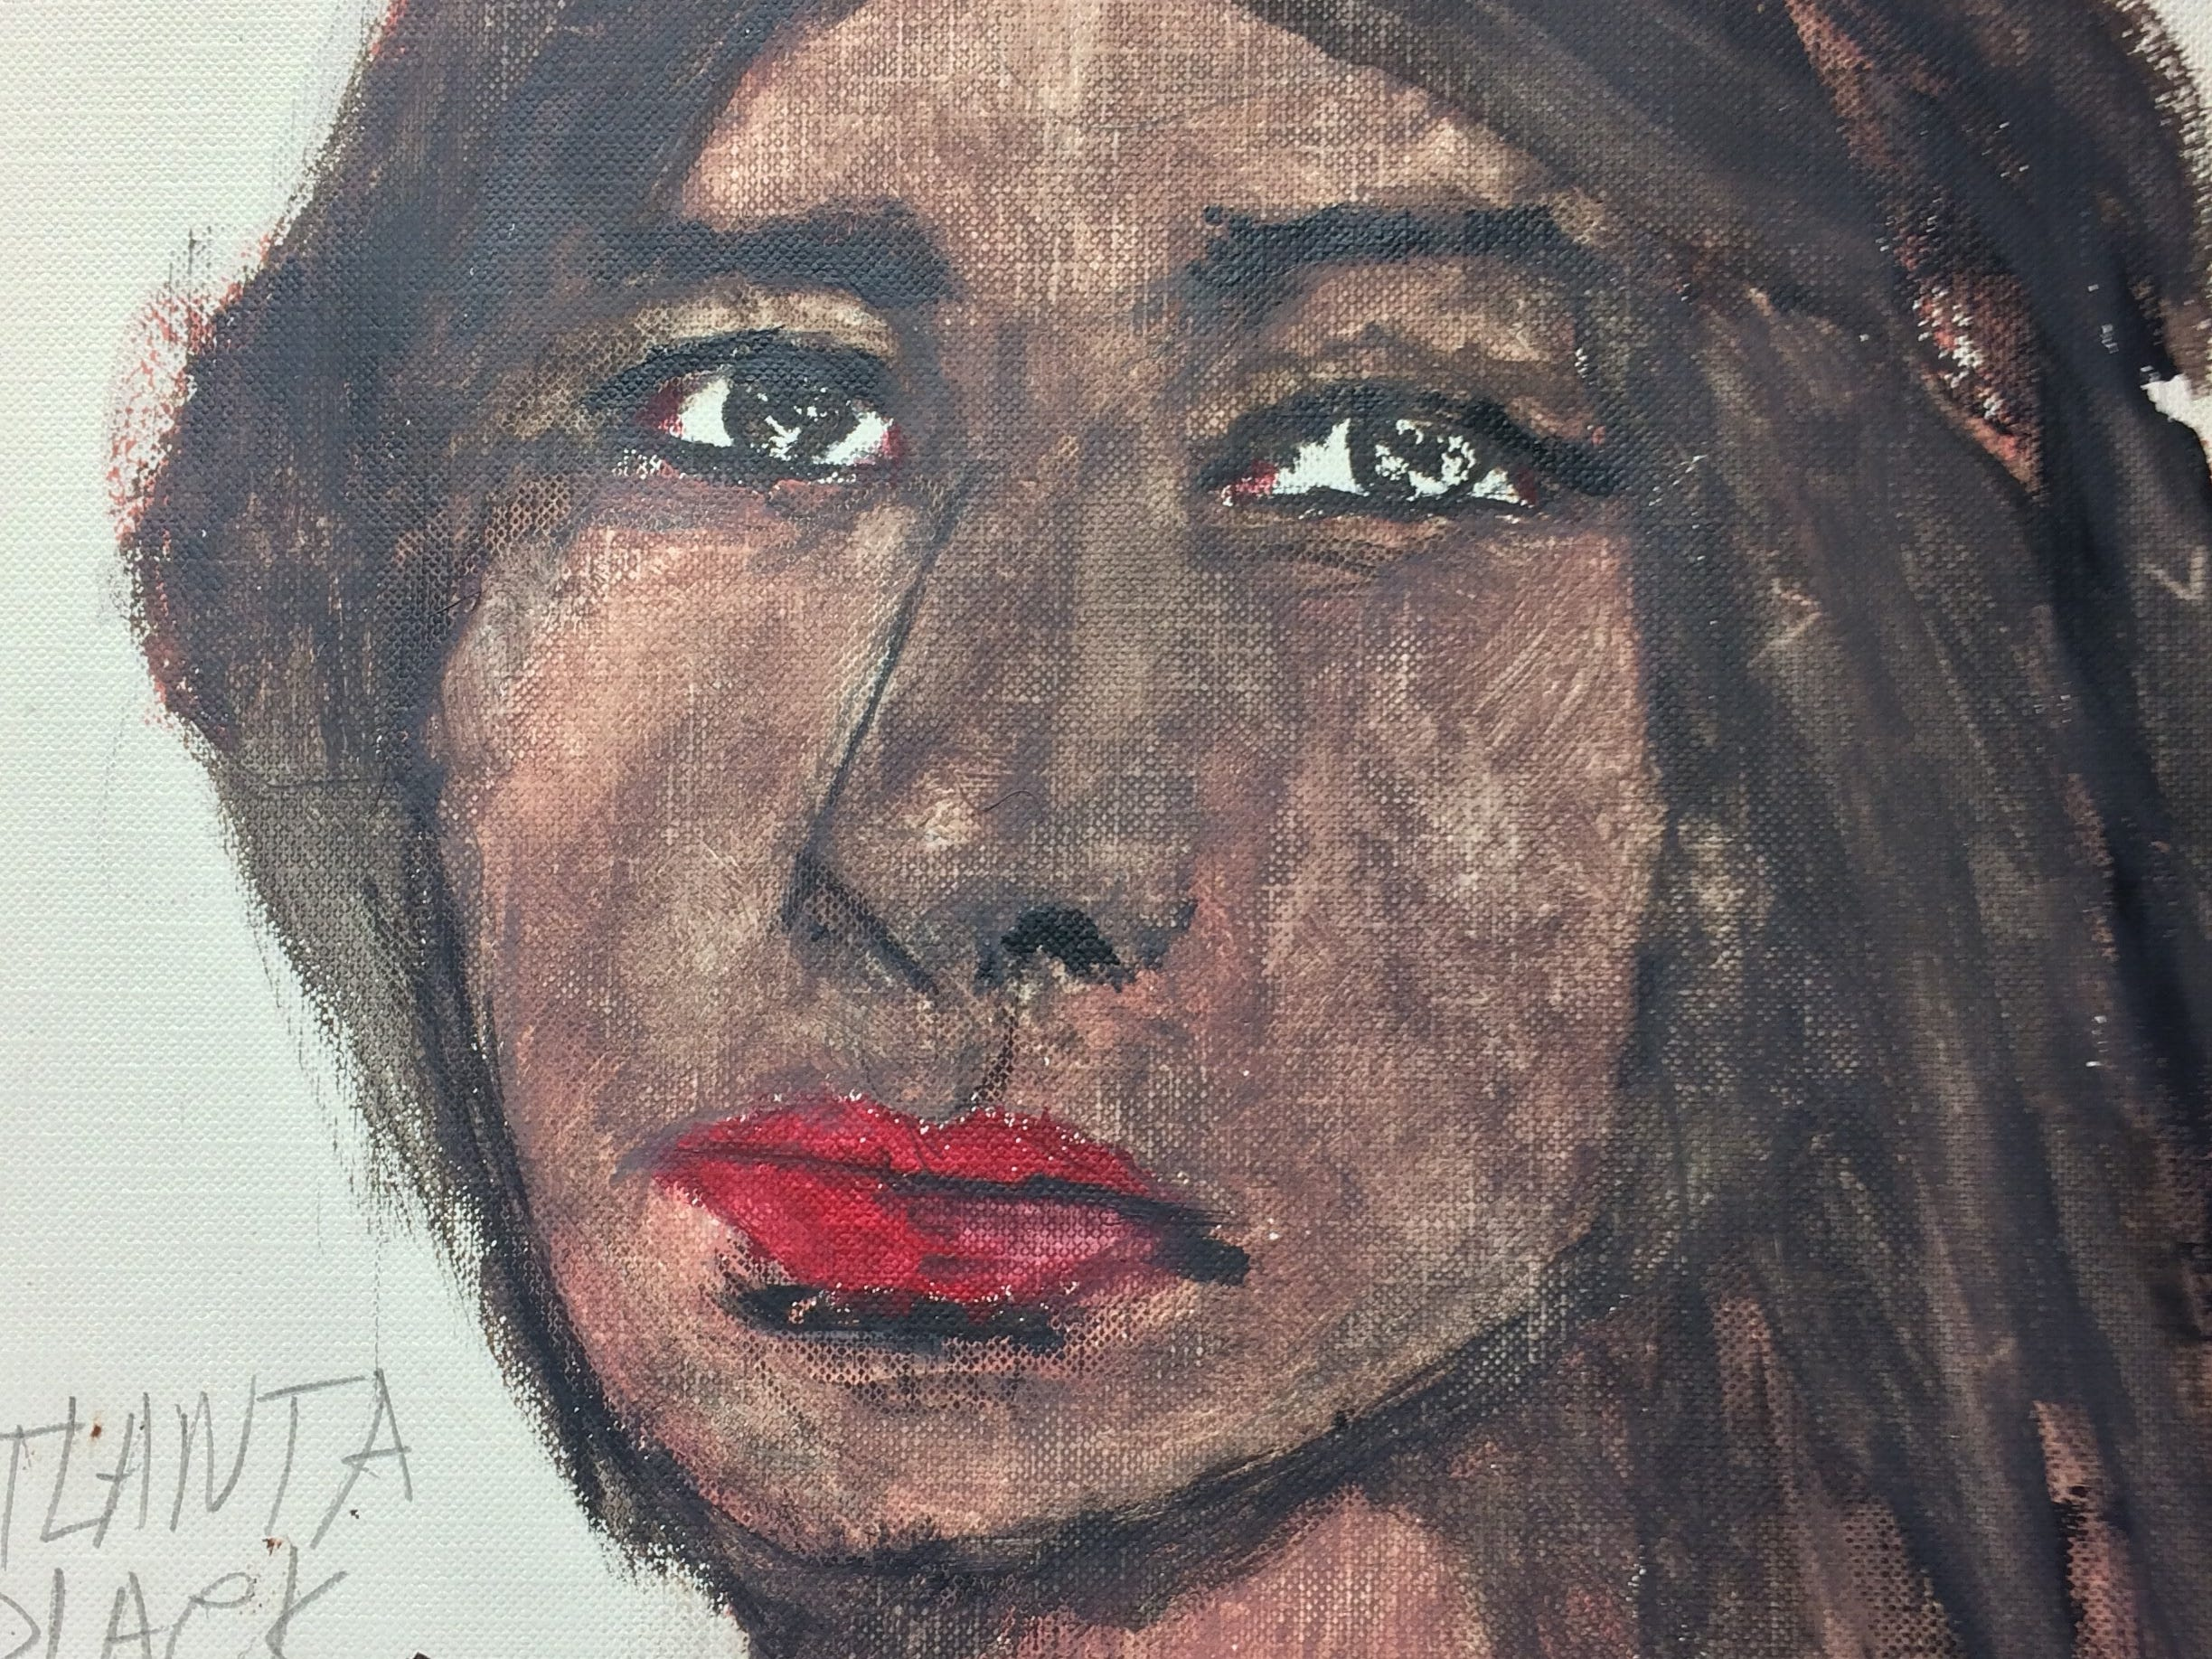 Serial killer Samuel Little drew this woman who he says he murdered in 1981 in Atlanta, Georgia.